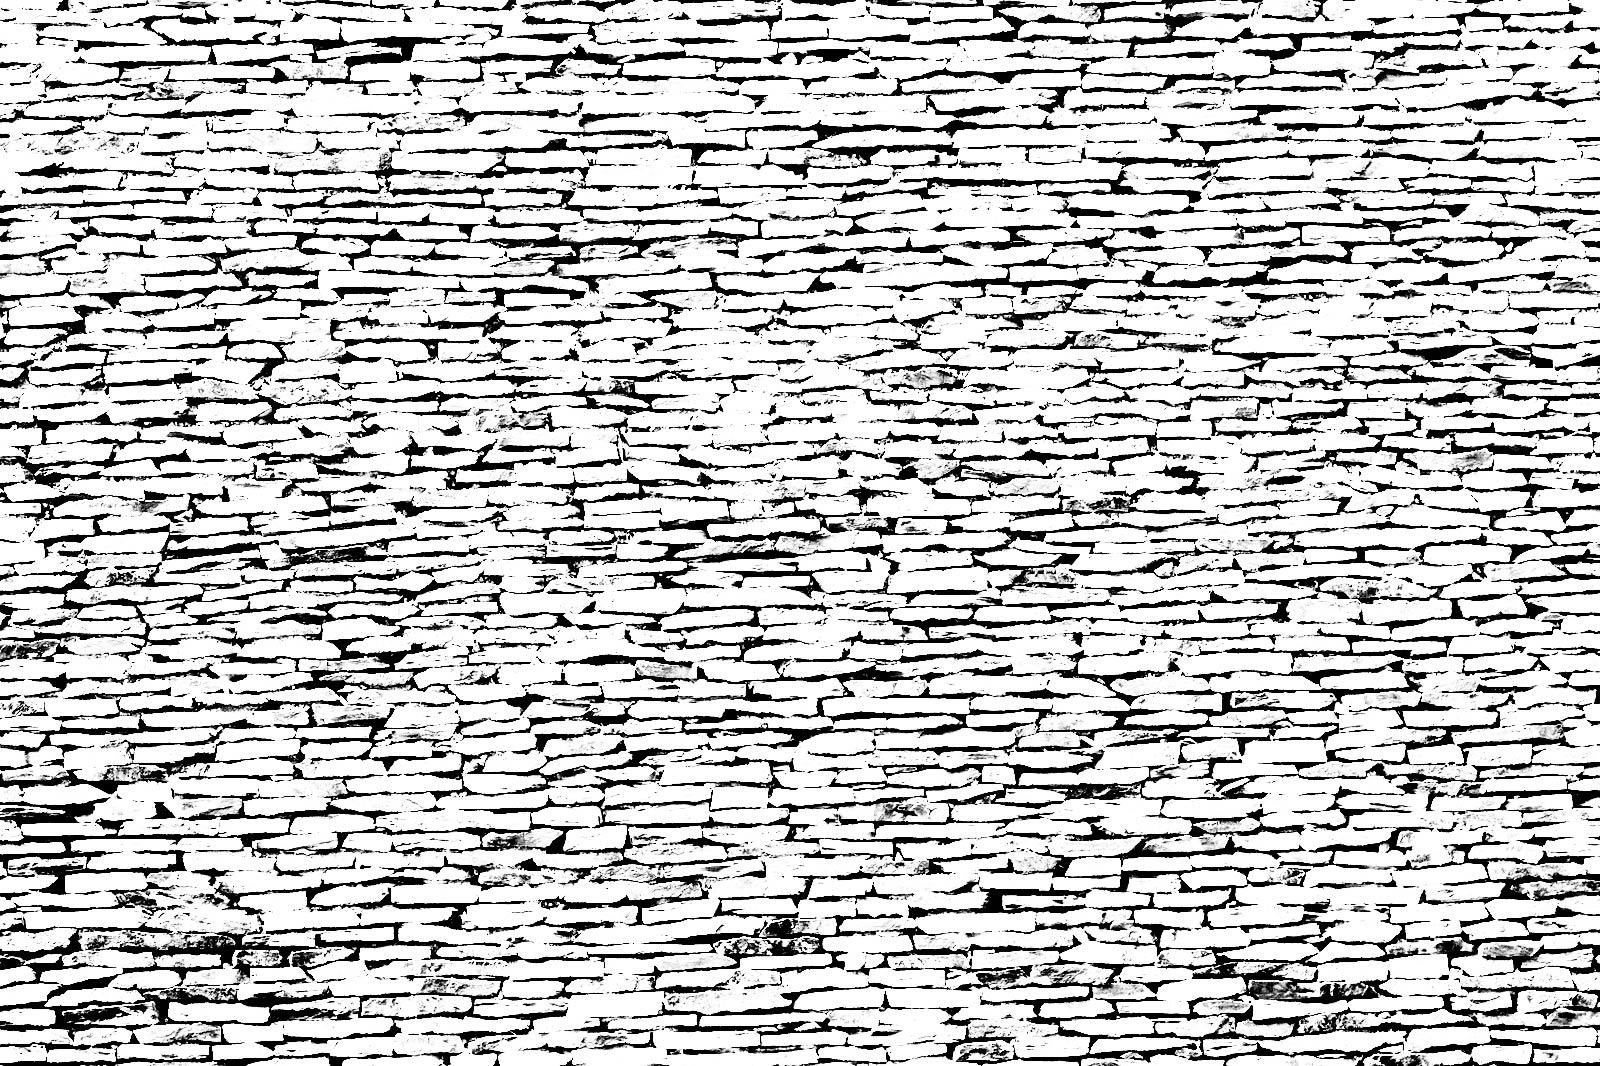 Pedra_displace.jpg